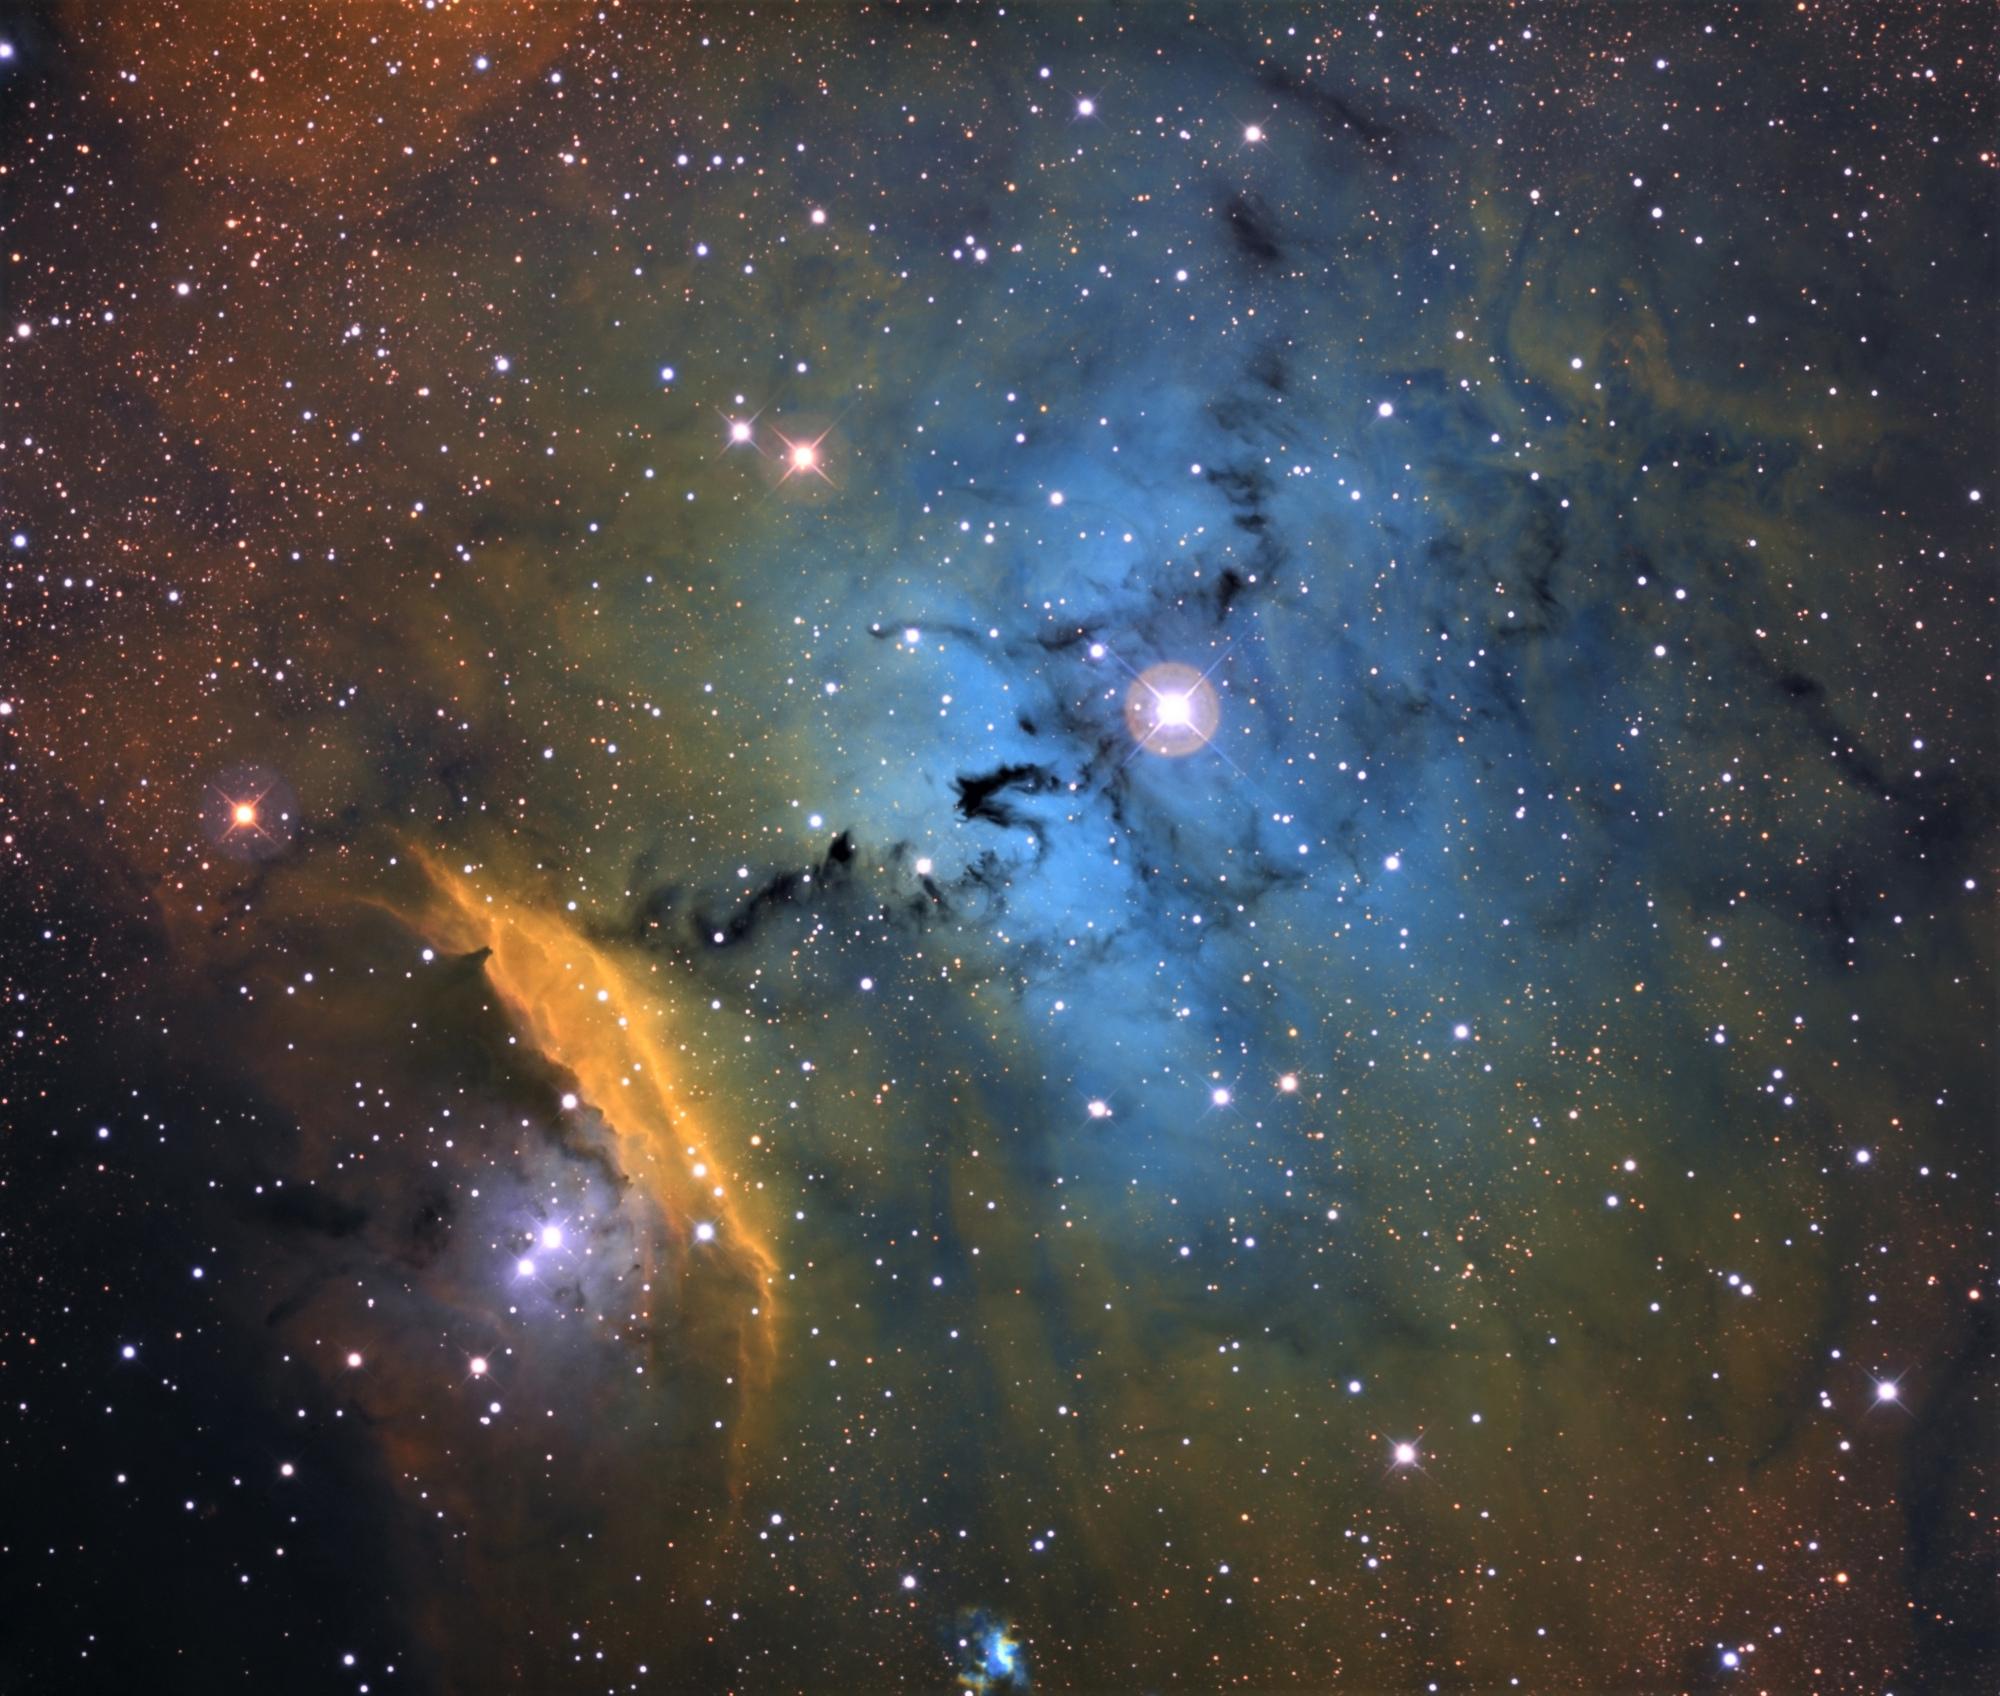 NGC6559-SHO-V12-PlusClair-PlusCoul.thumb.jpg.9c9f554f5f5677f8879206cbda5d3f16.jpg